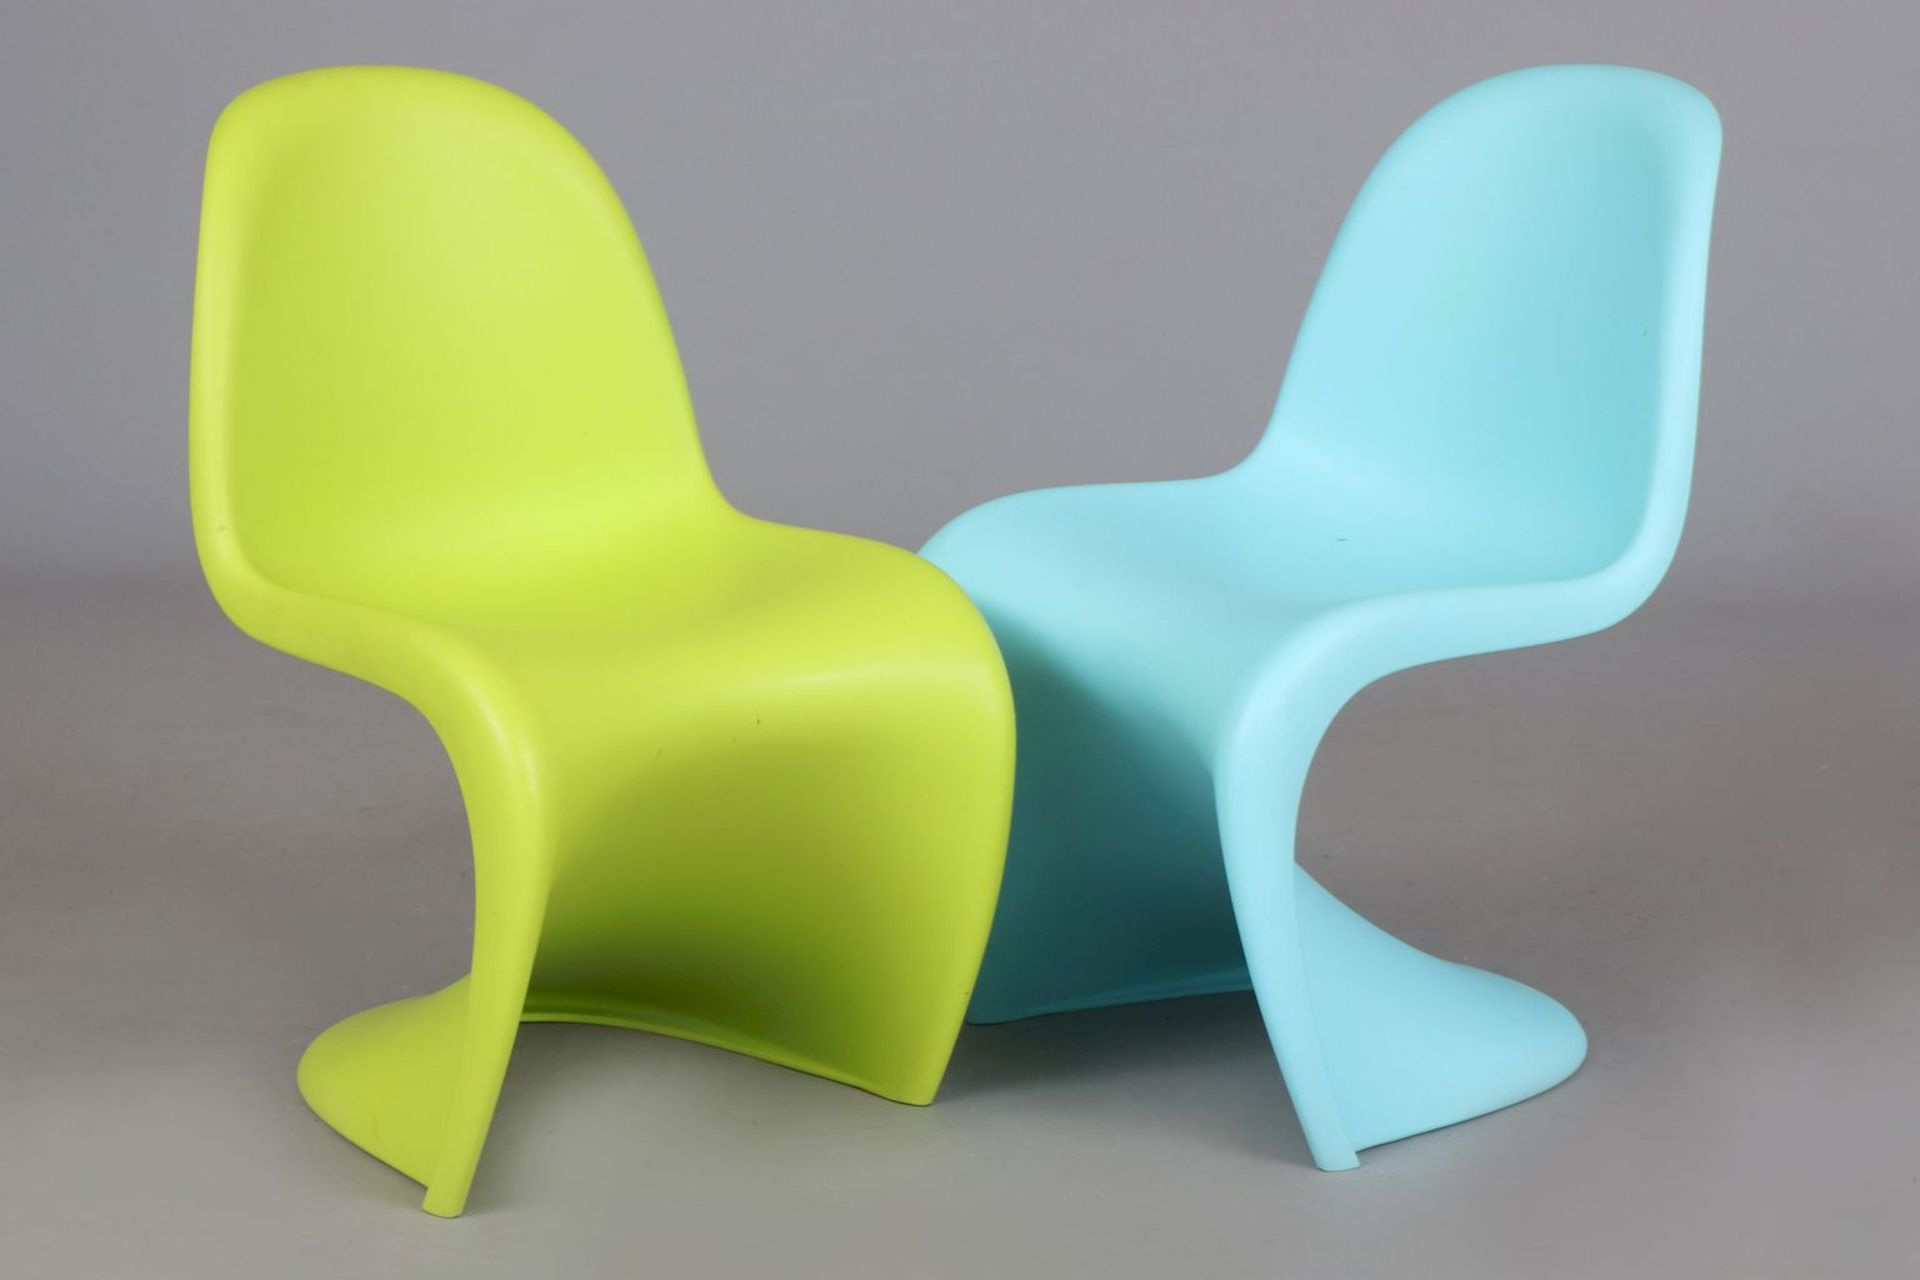 2 VERNER PANTON Kinder (Junior) ¨Panton Chairs¨